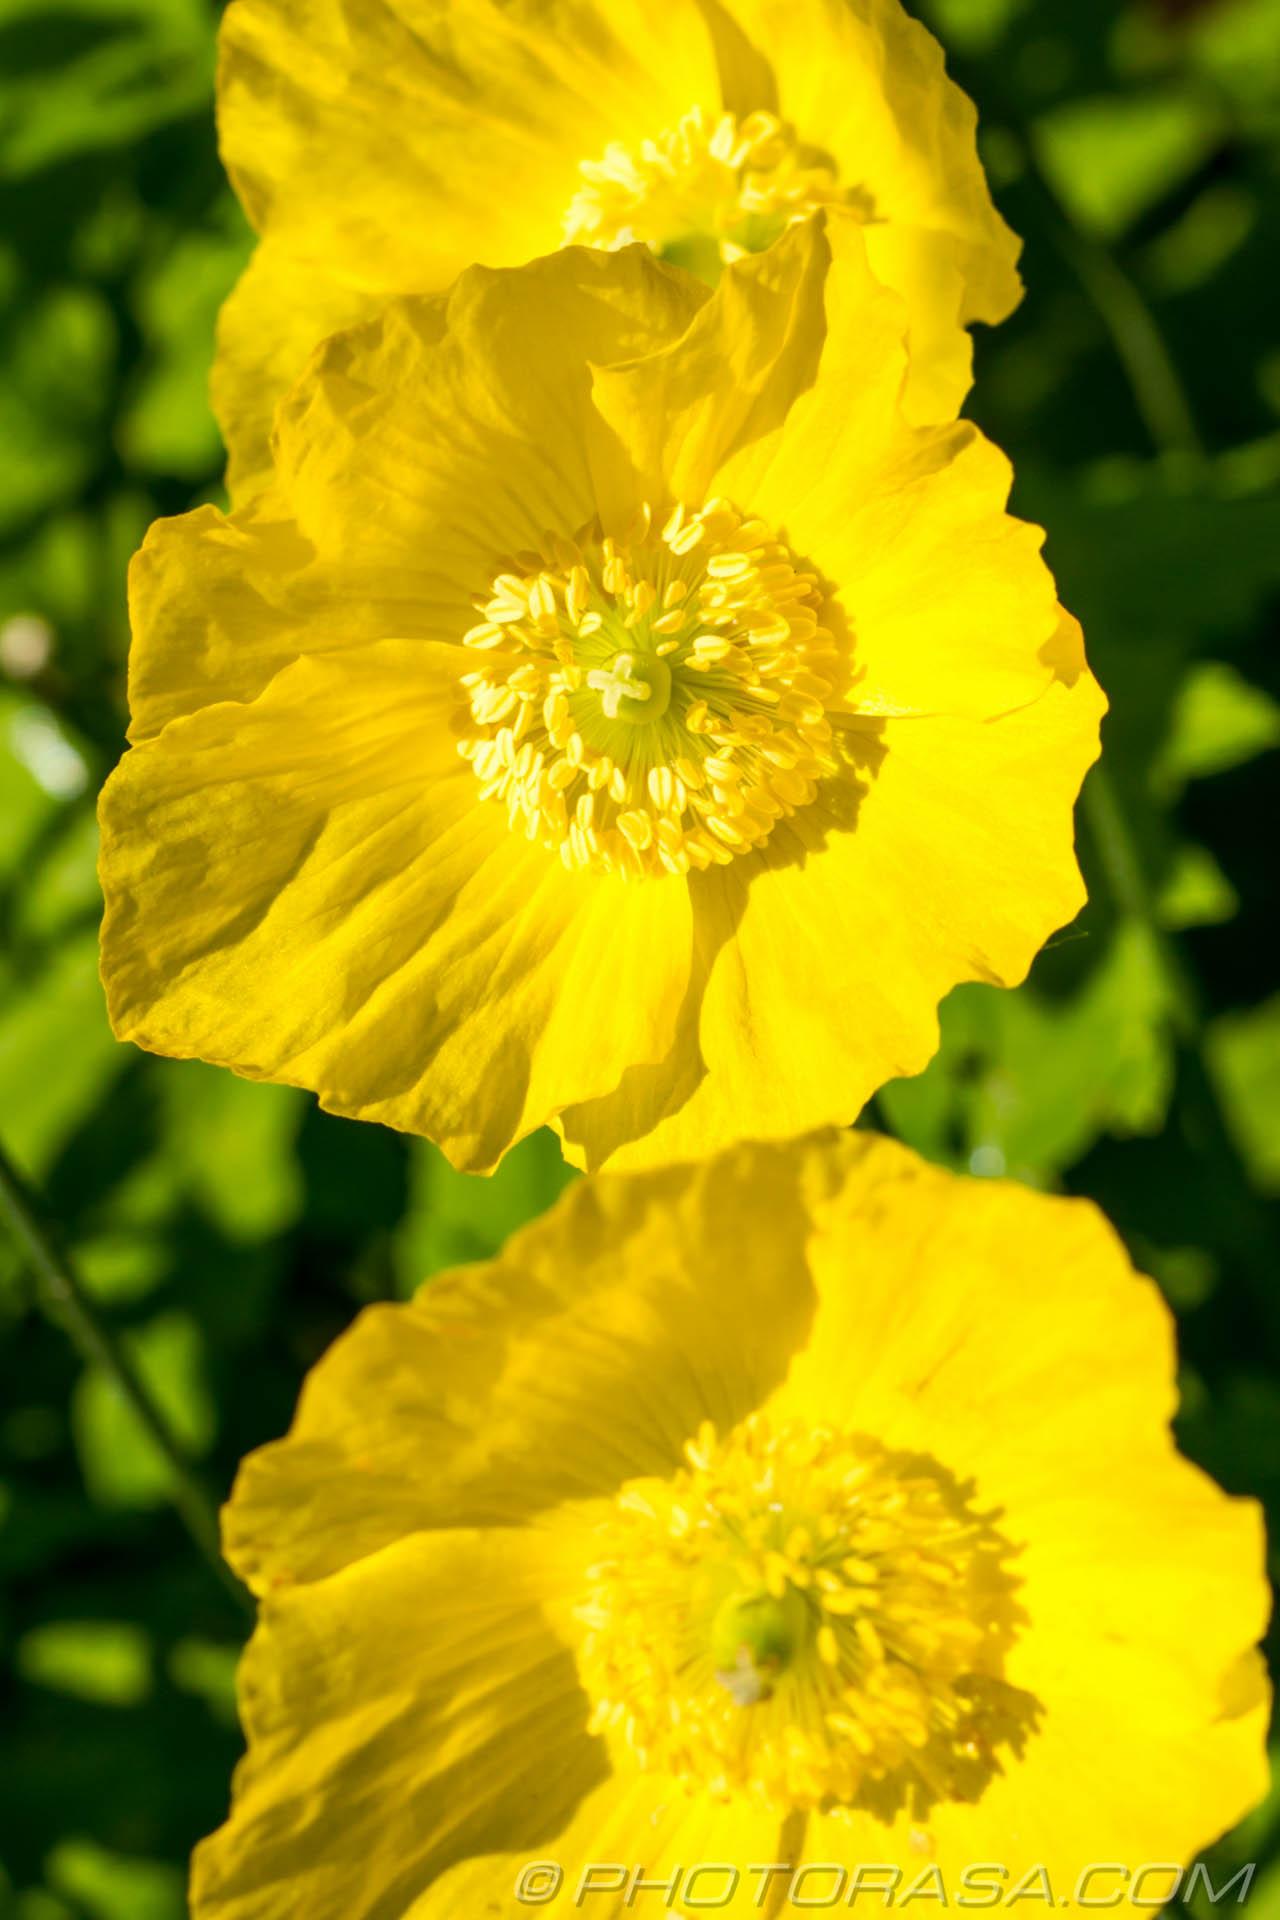 http://photorasa.com/buttercups/large-buttercups/